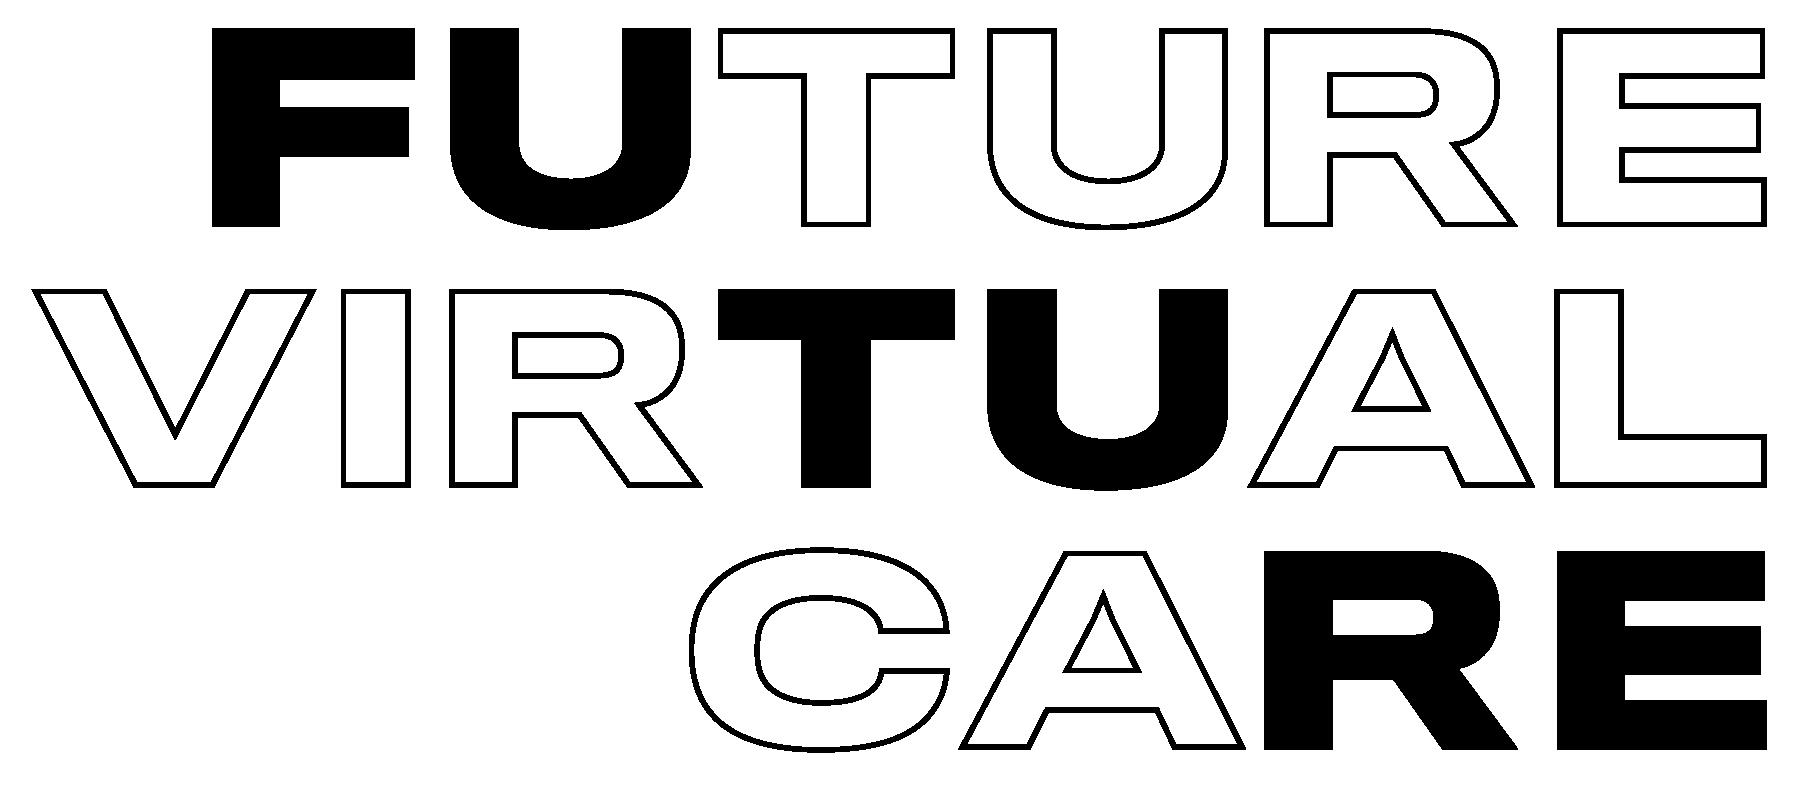 Telehealth_Black-02.png